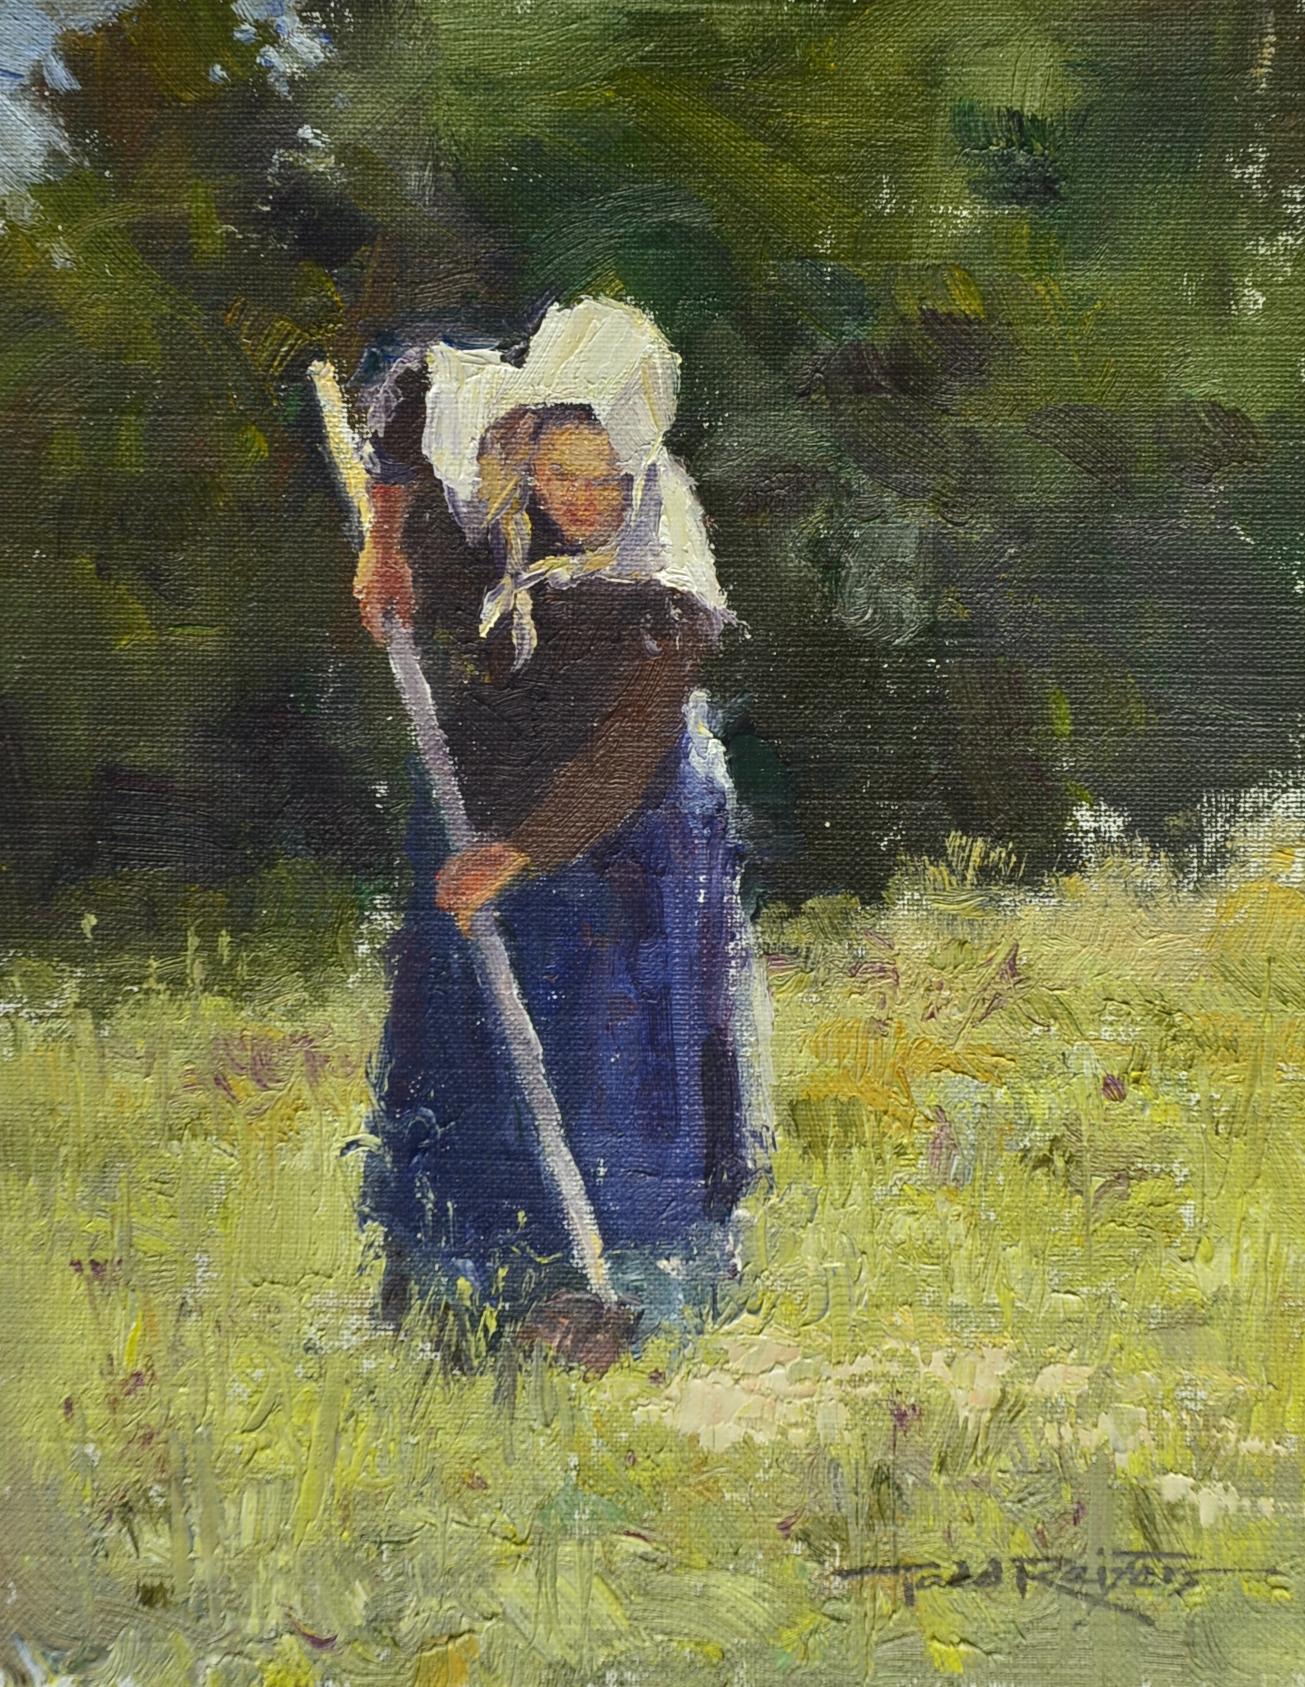 reifers-weedingthegarden-cropped